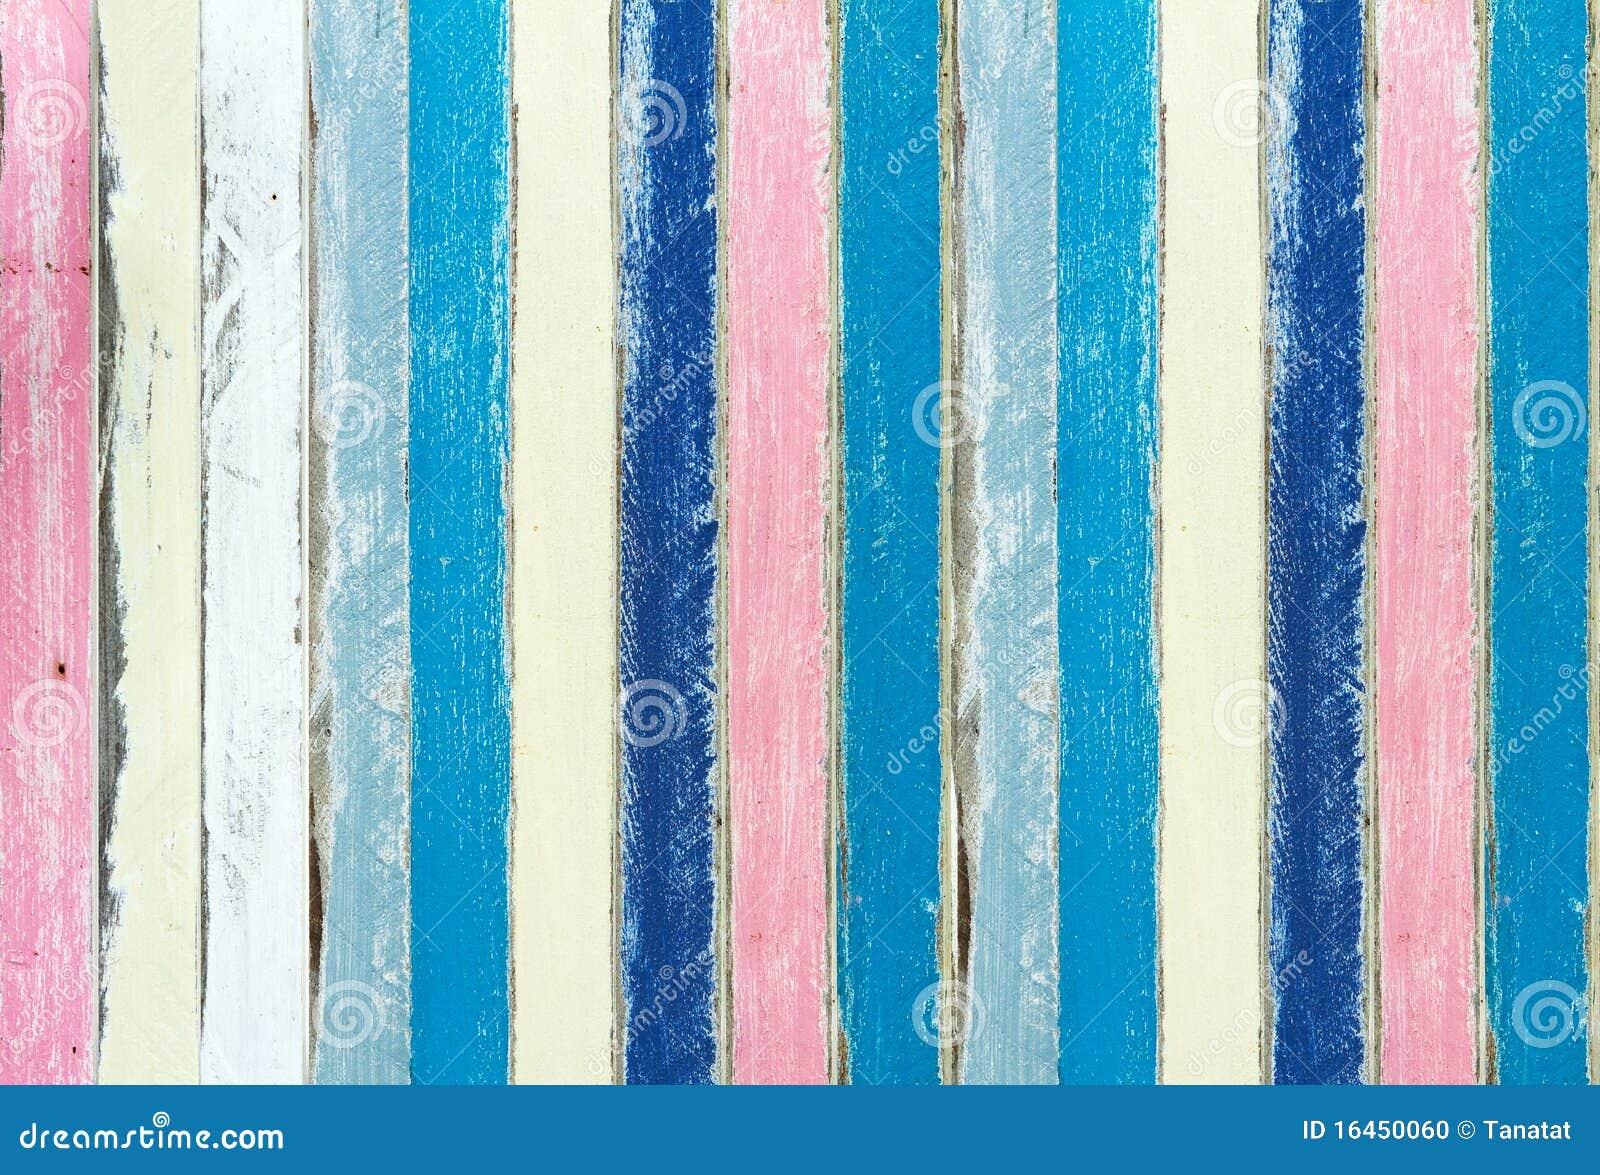 color fondo madera pastel pintura